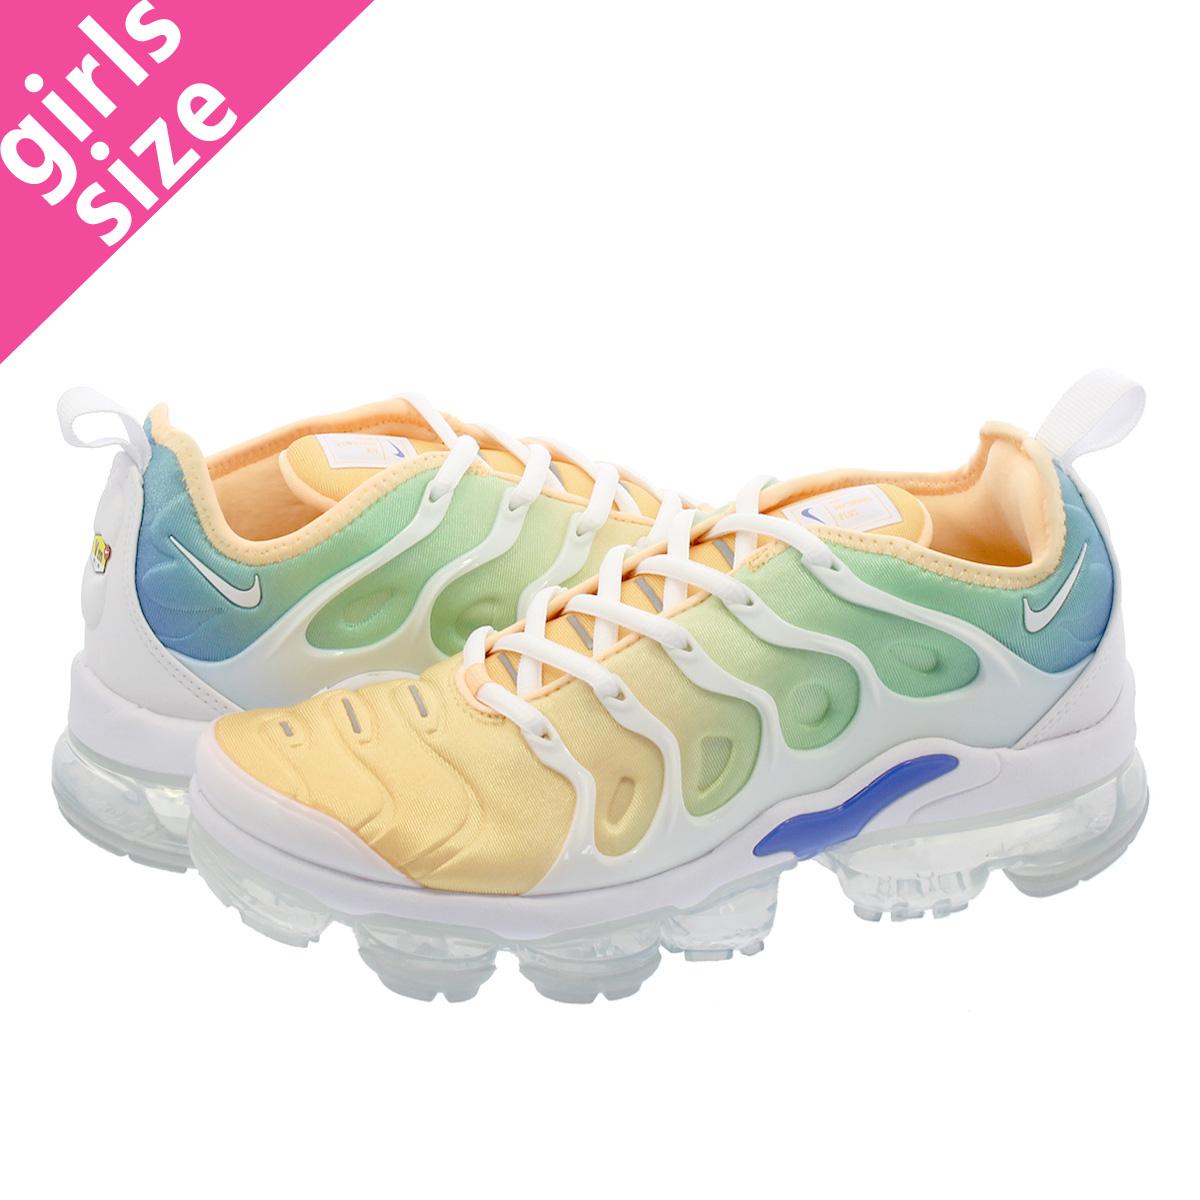 773828a92a2 NIKE WMNS AIR VAPORMAX PLUS Nike women air vapor max plus WHITE WHITE LIGHT  MENTA TANGER ao4550-100